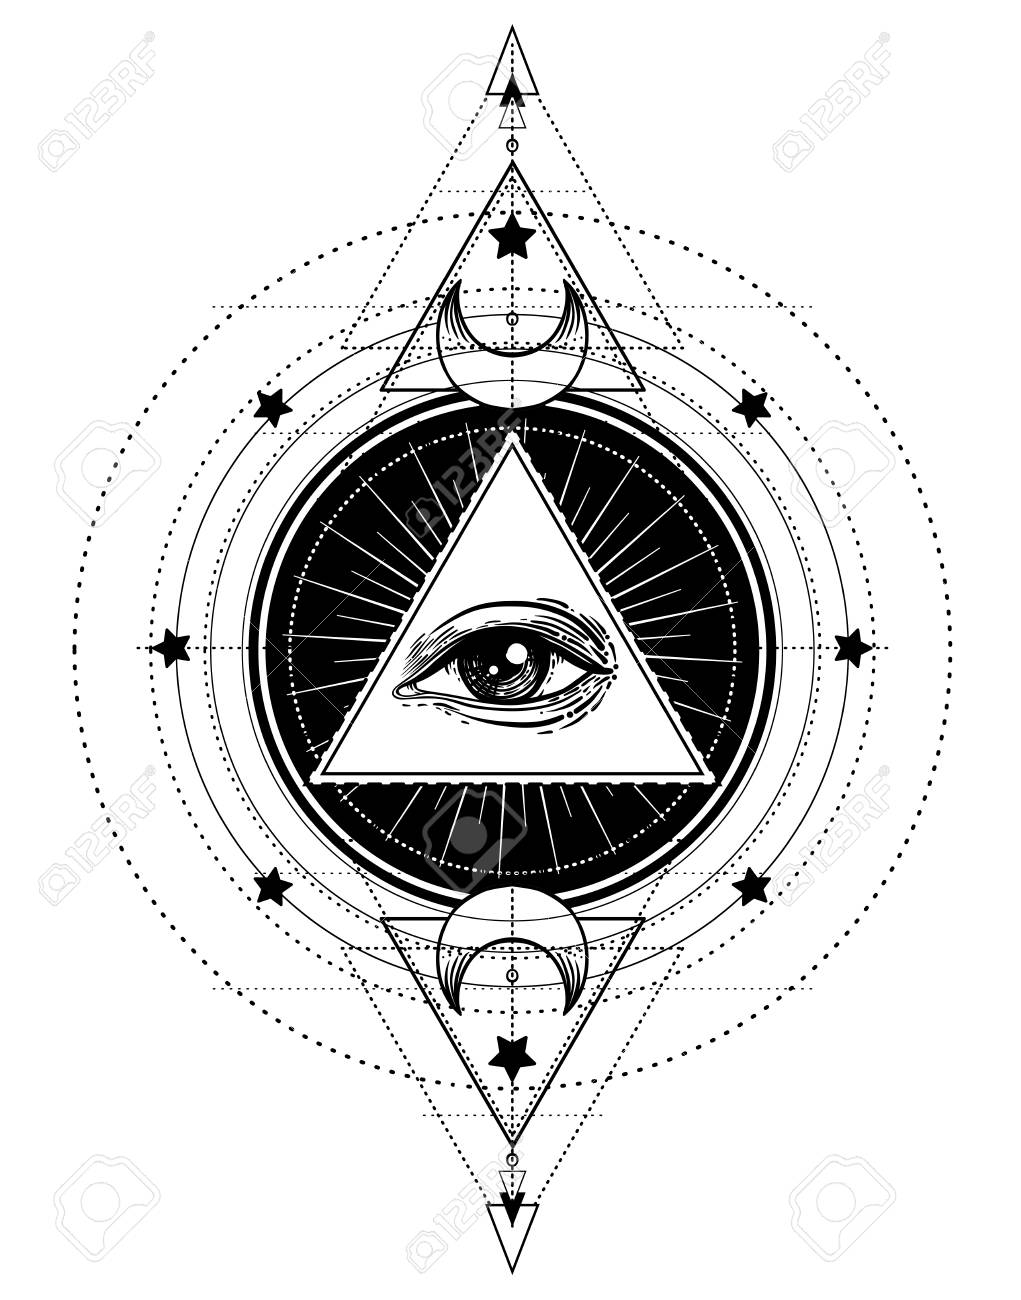 Blackwork Tattoo Flash Eye Of Providence Masonic Symbol All Seeing Inside Triangle